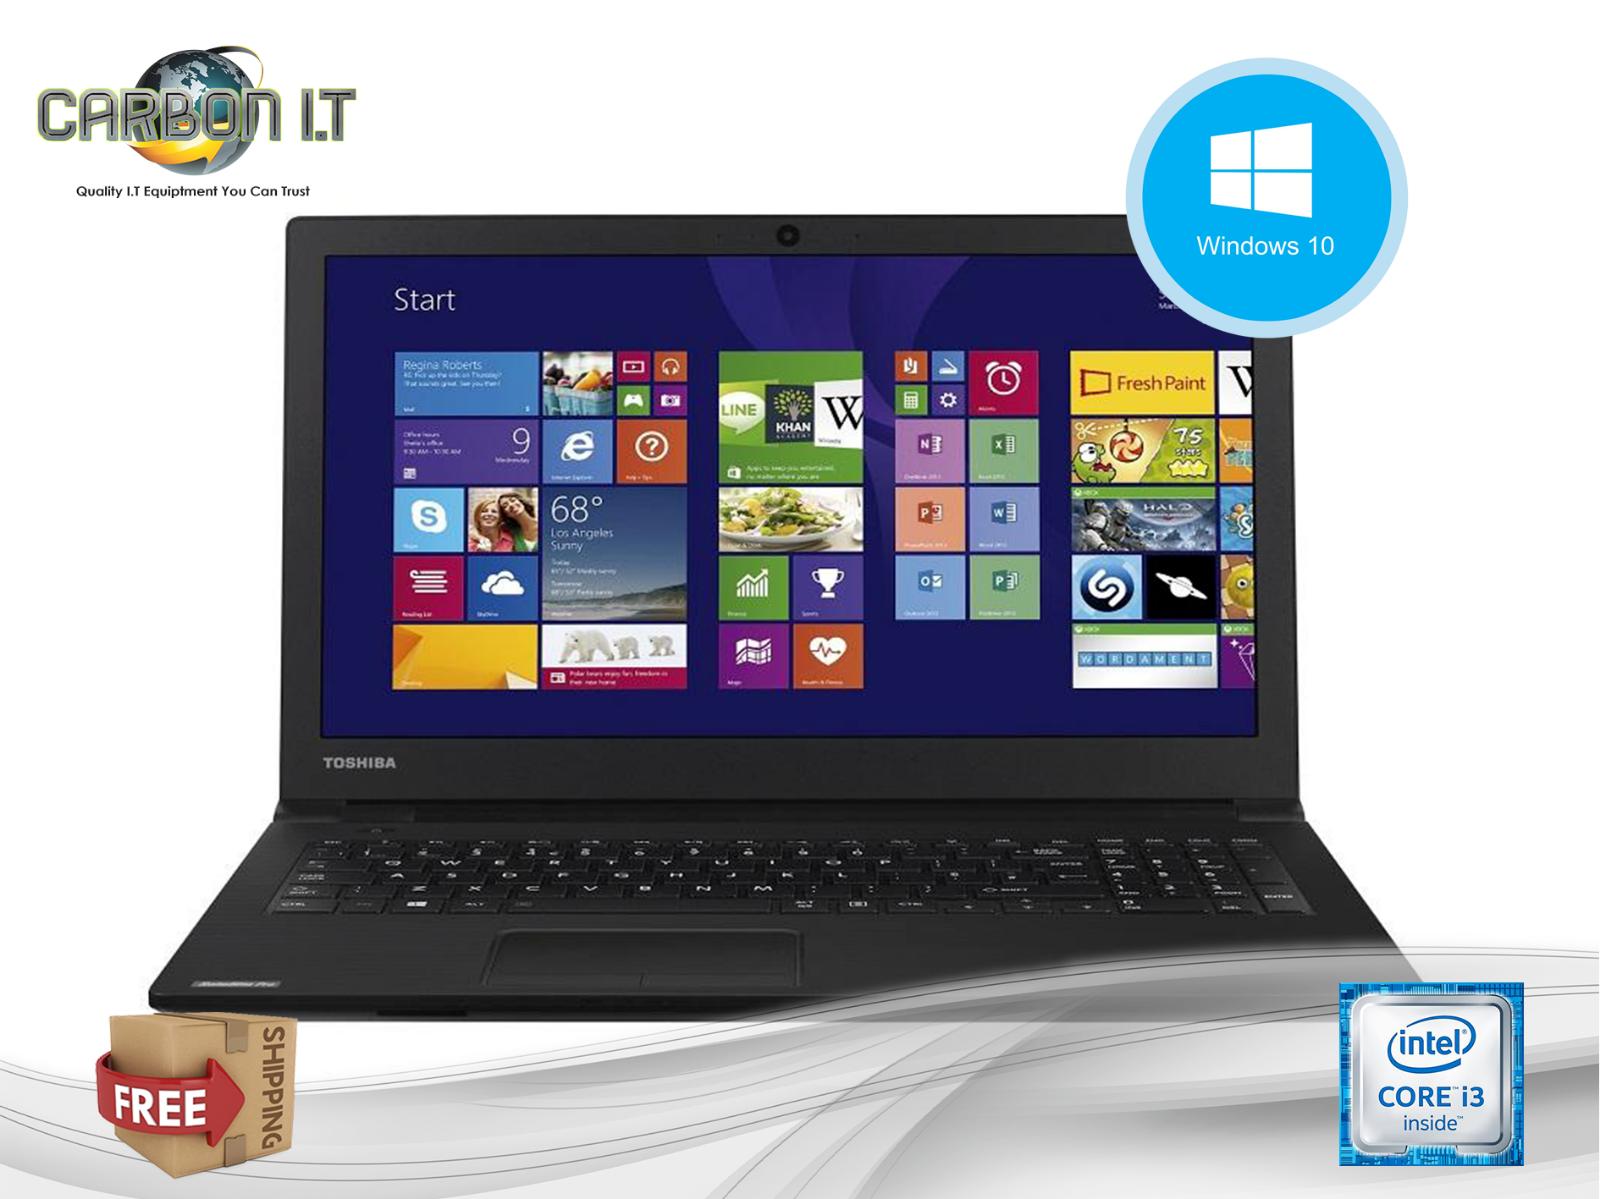 "Laptop Windows - Cheap Refurbished Windows 10 15.6"" Laptop Toshiba Satellite Pro R50 i3 4GB 500GB"